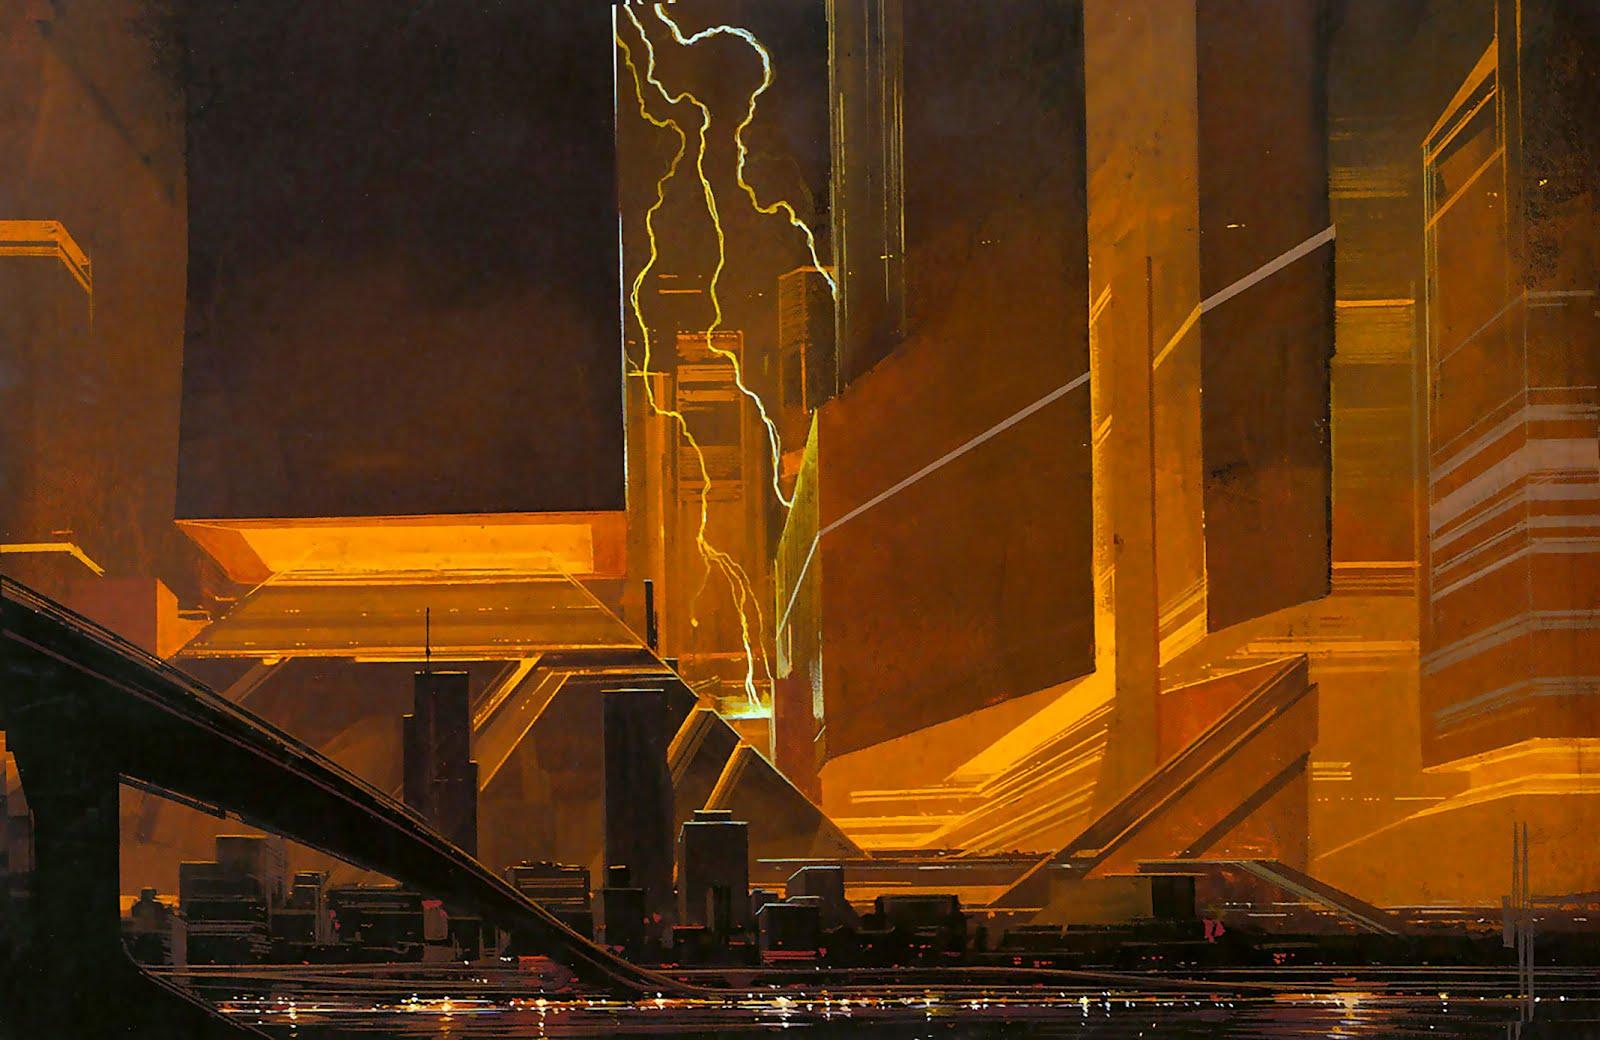 Syd Mead, Concept art per Blade Runner